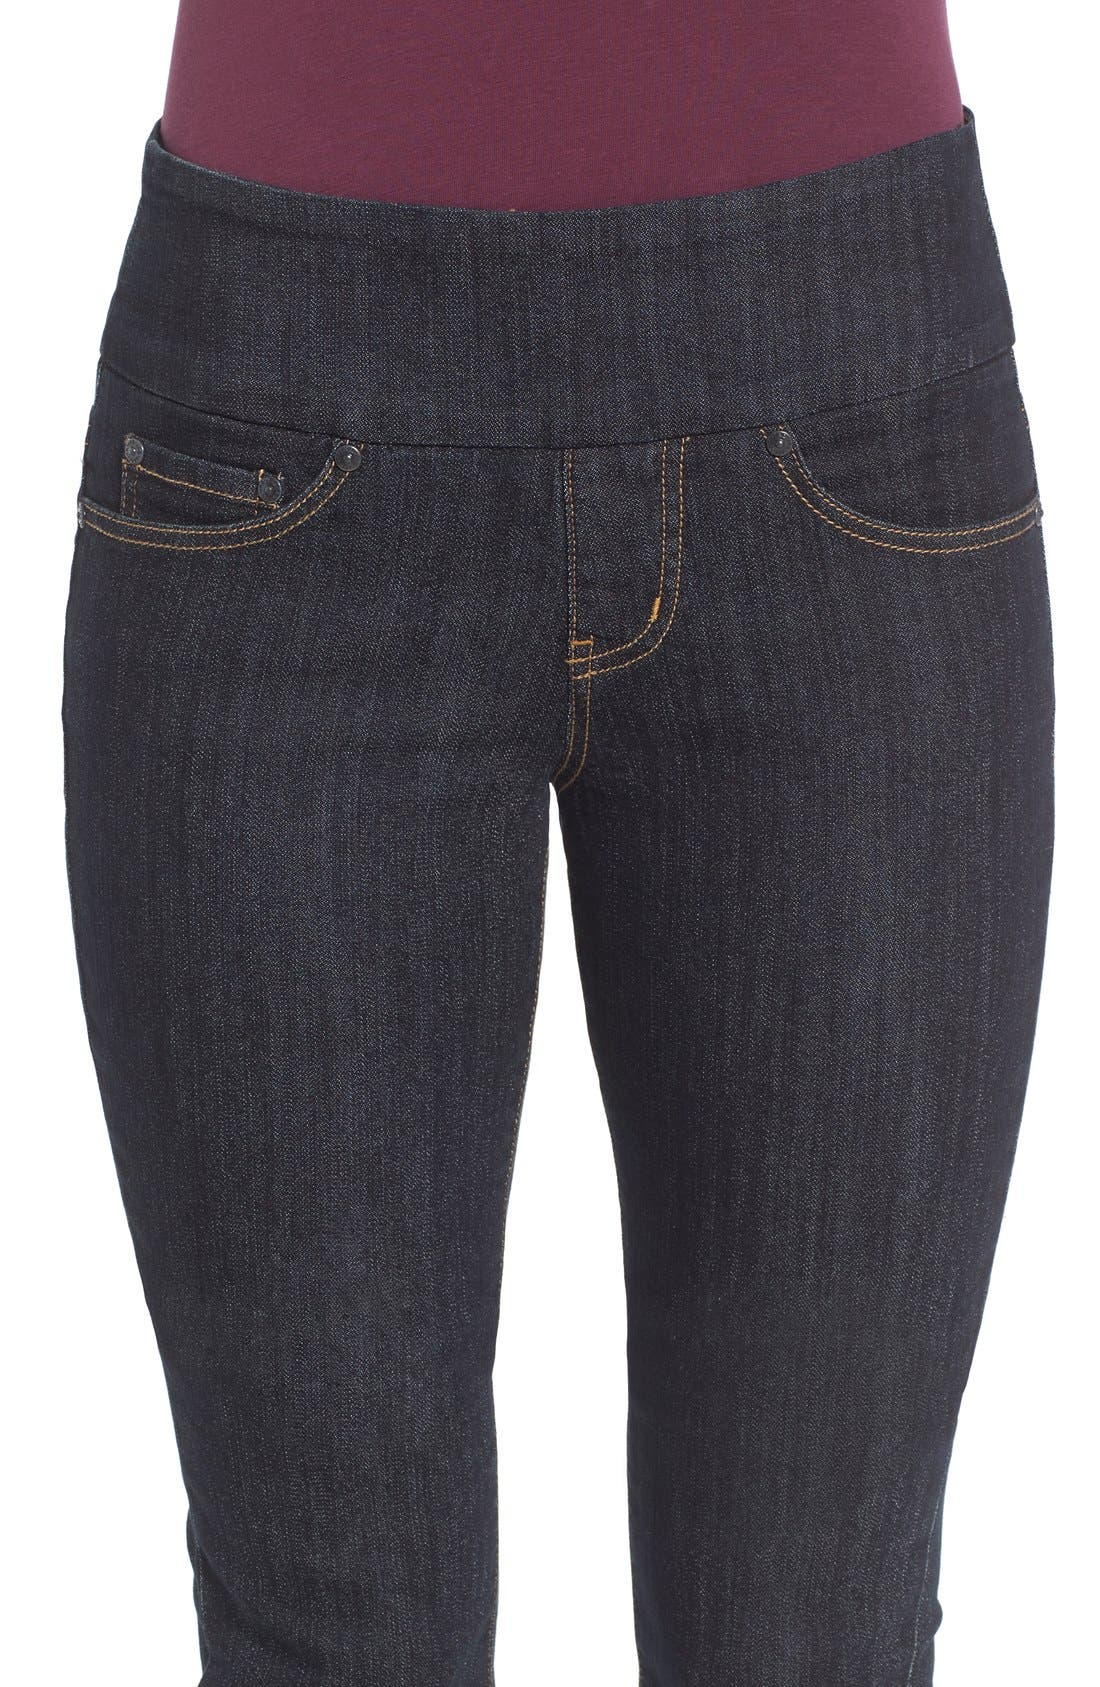 'Peri' Pull-On Stretch Straight Leg Jeans,                             Alternate thumbnail 3, color,                             402